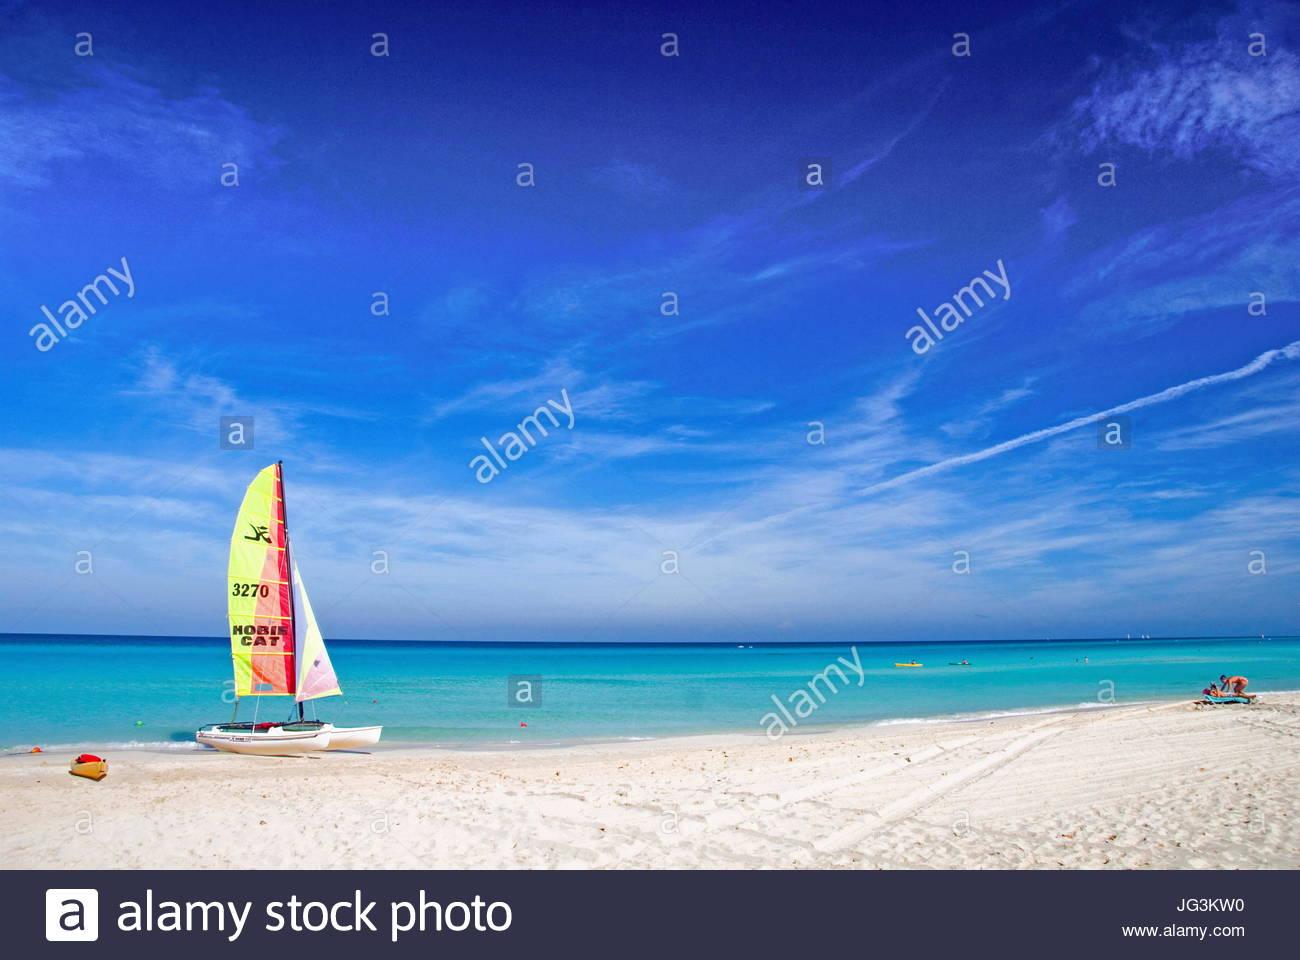 VP 5766517, Katamaran, Varadero, Kuba, Karibik bin Strang [Copyright-Hinweis: Frauke Scholz/McPHOTO/Vario Bilder] Stockbild